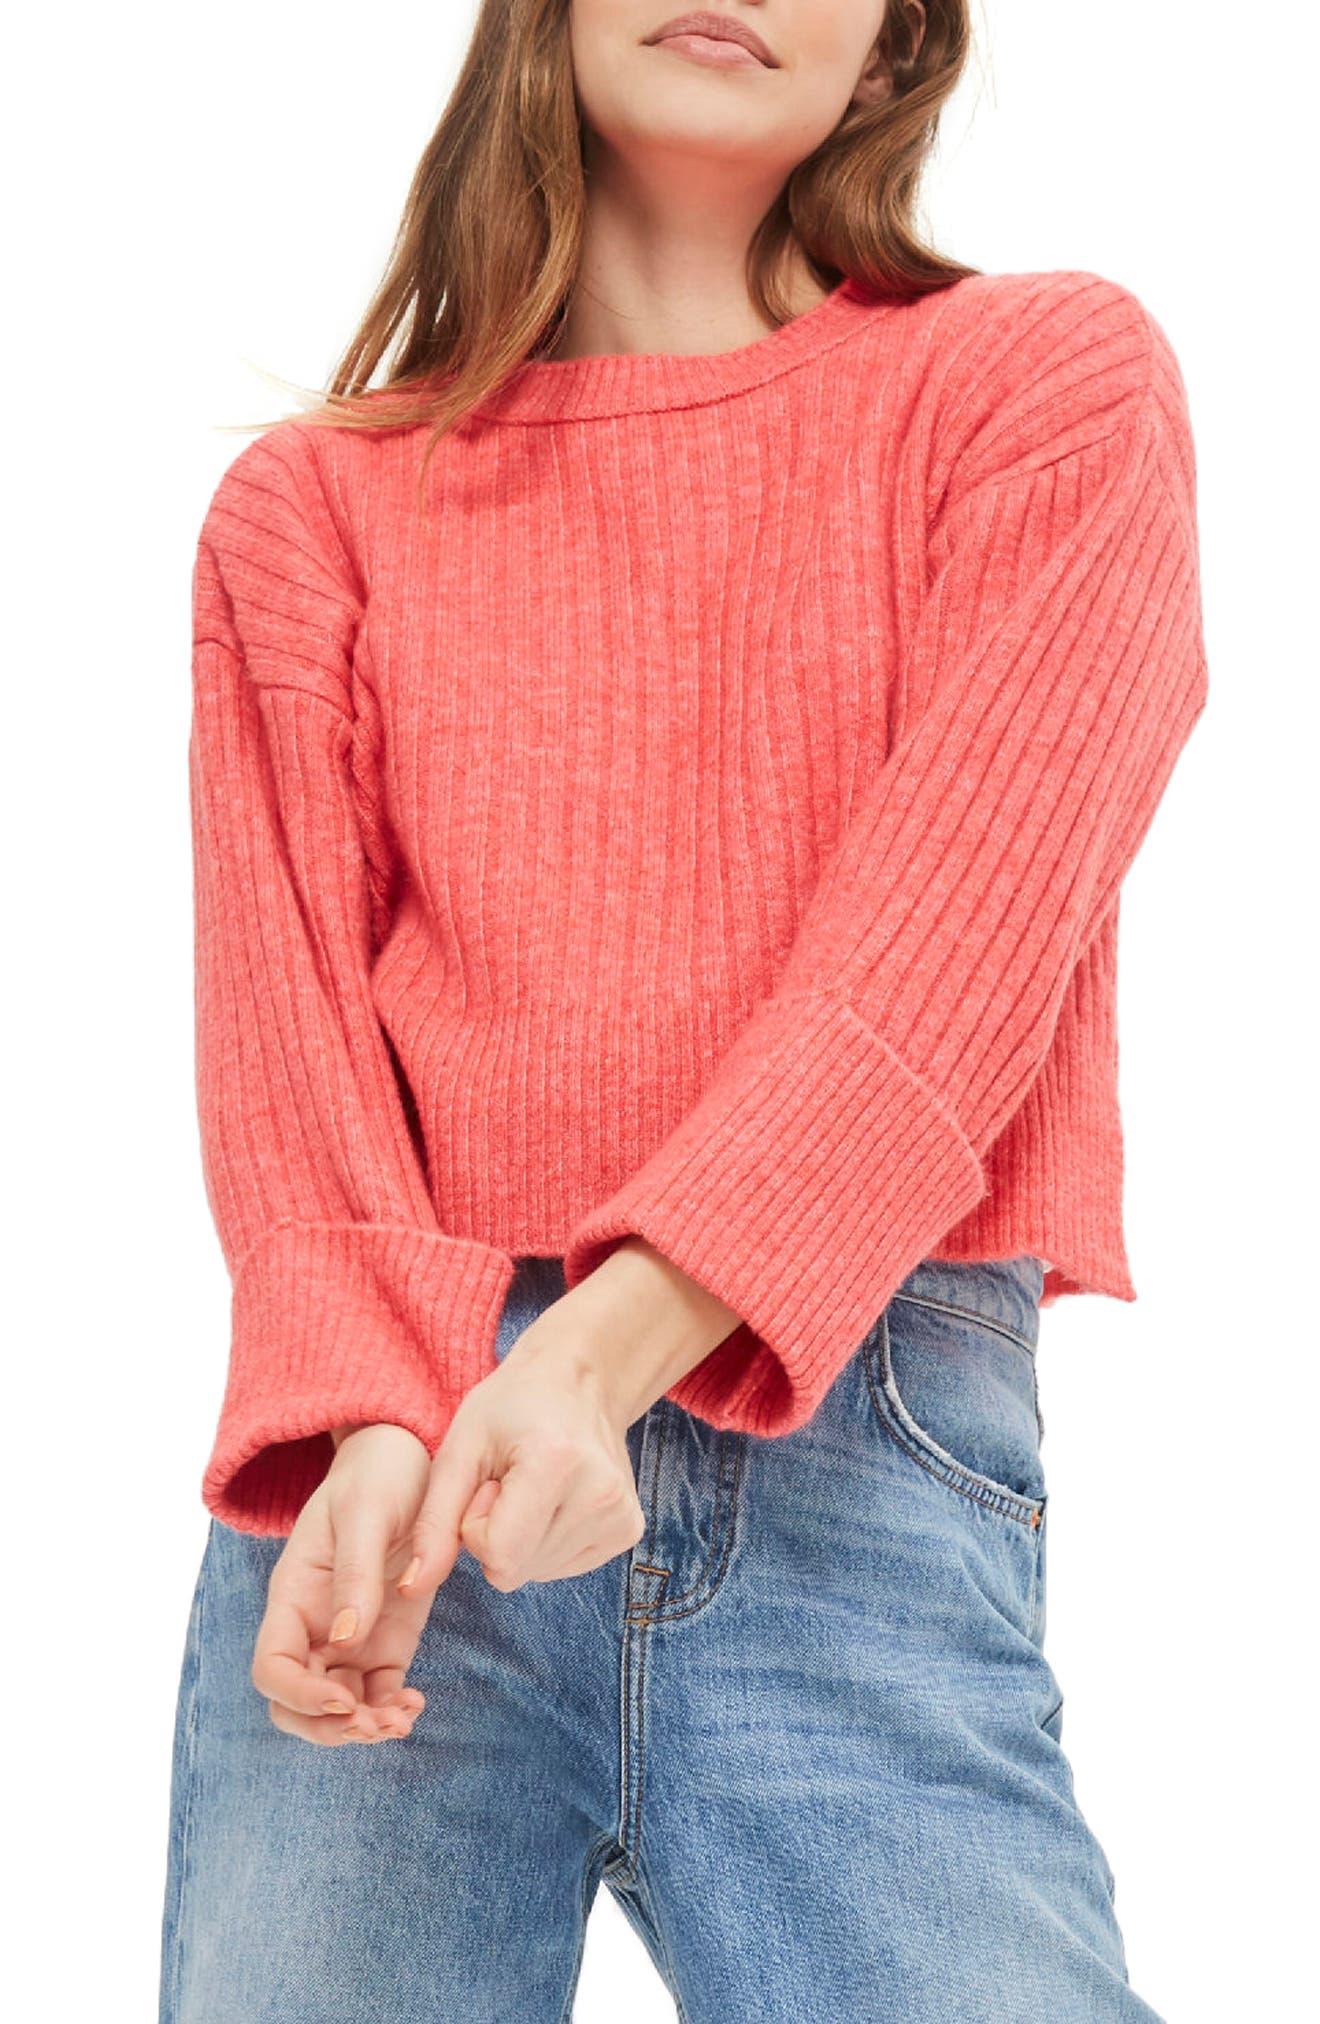 Topshop Rib Knit Crop Sweater